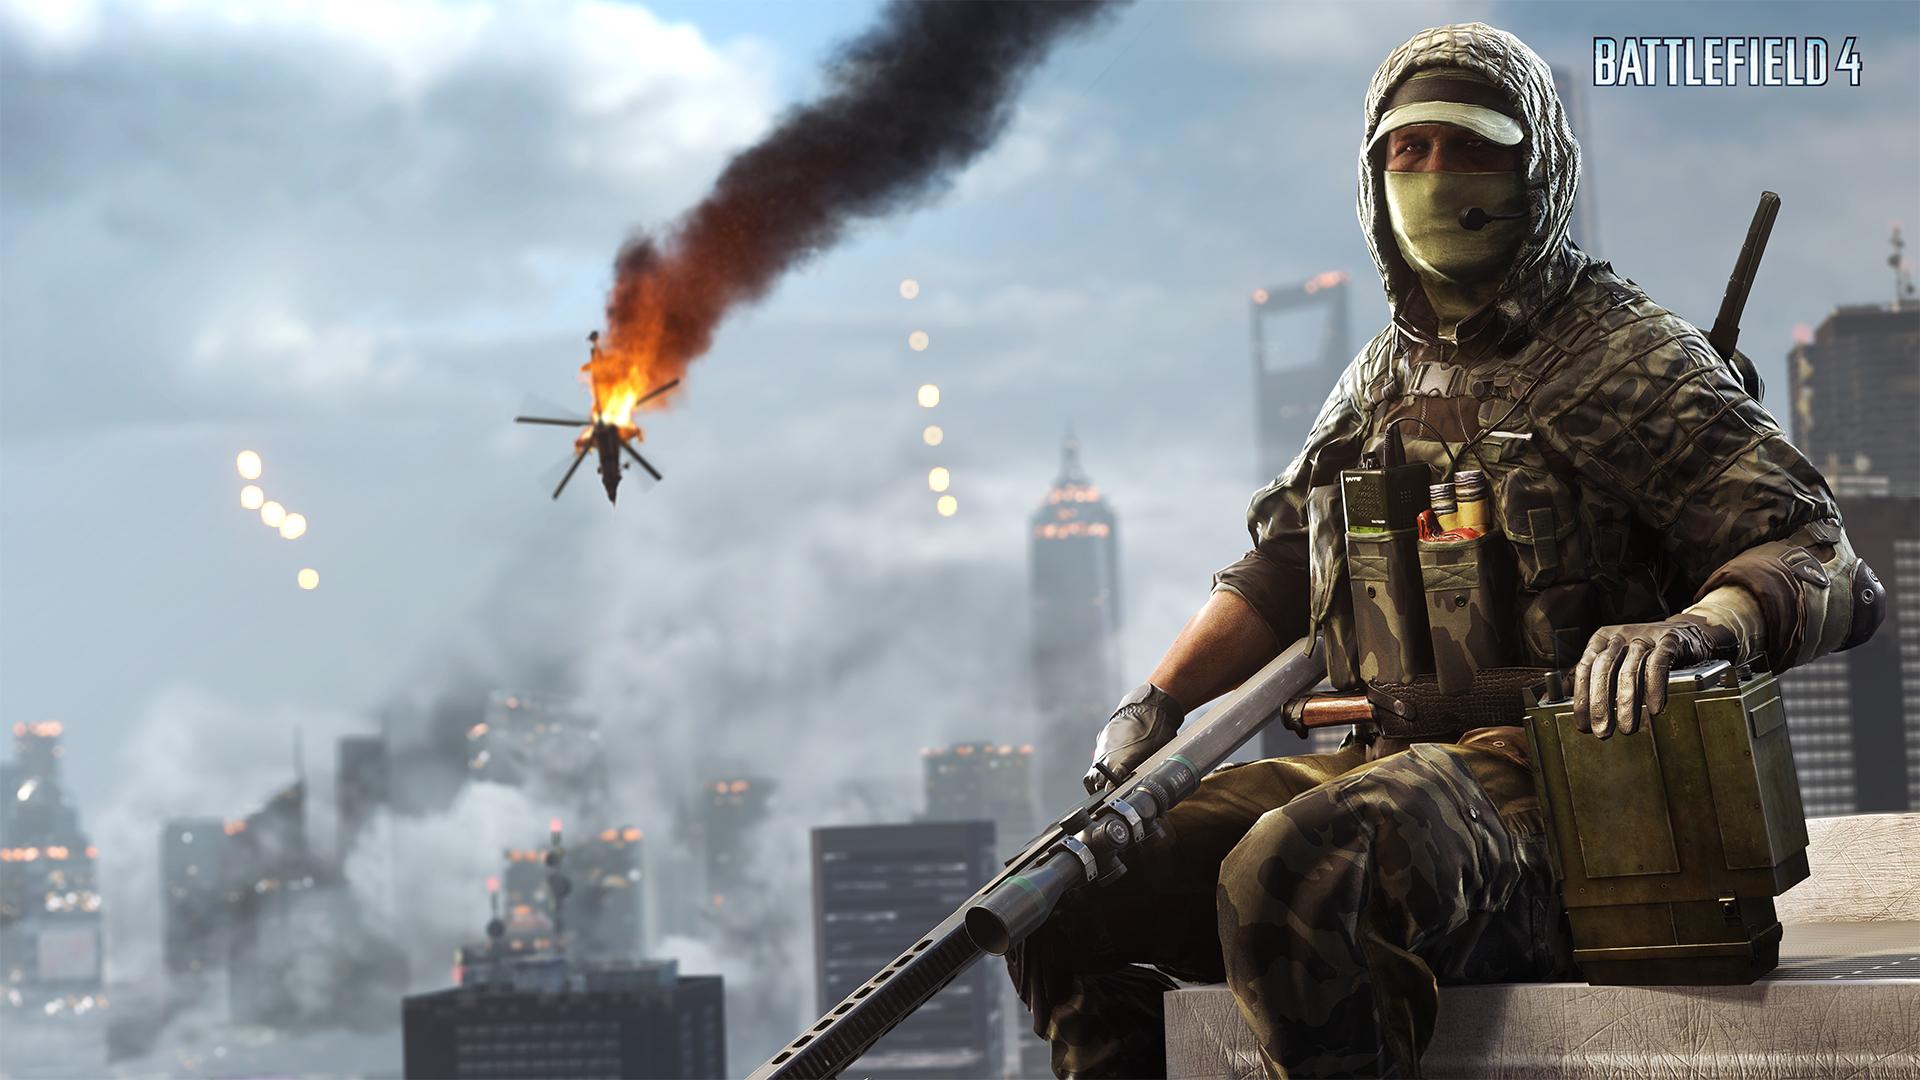 Battlefield 4 Recon Wallpaper   1920X1080   Battlefield Informer 1920x1080